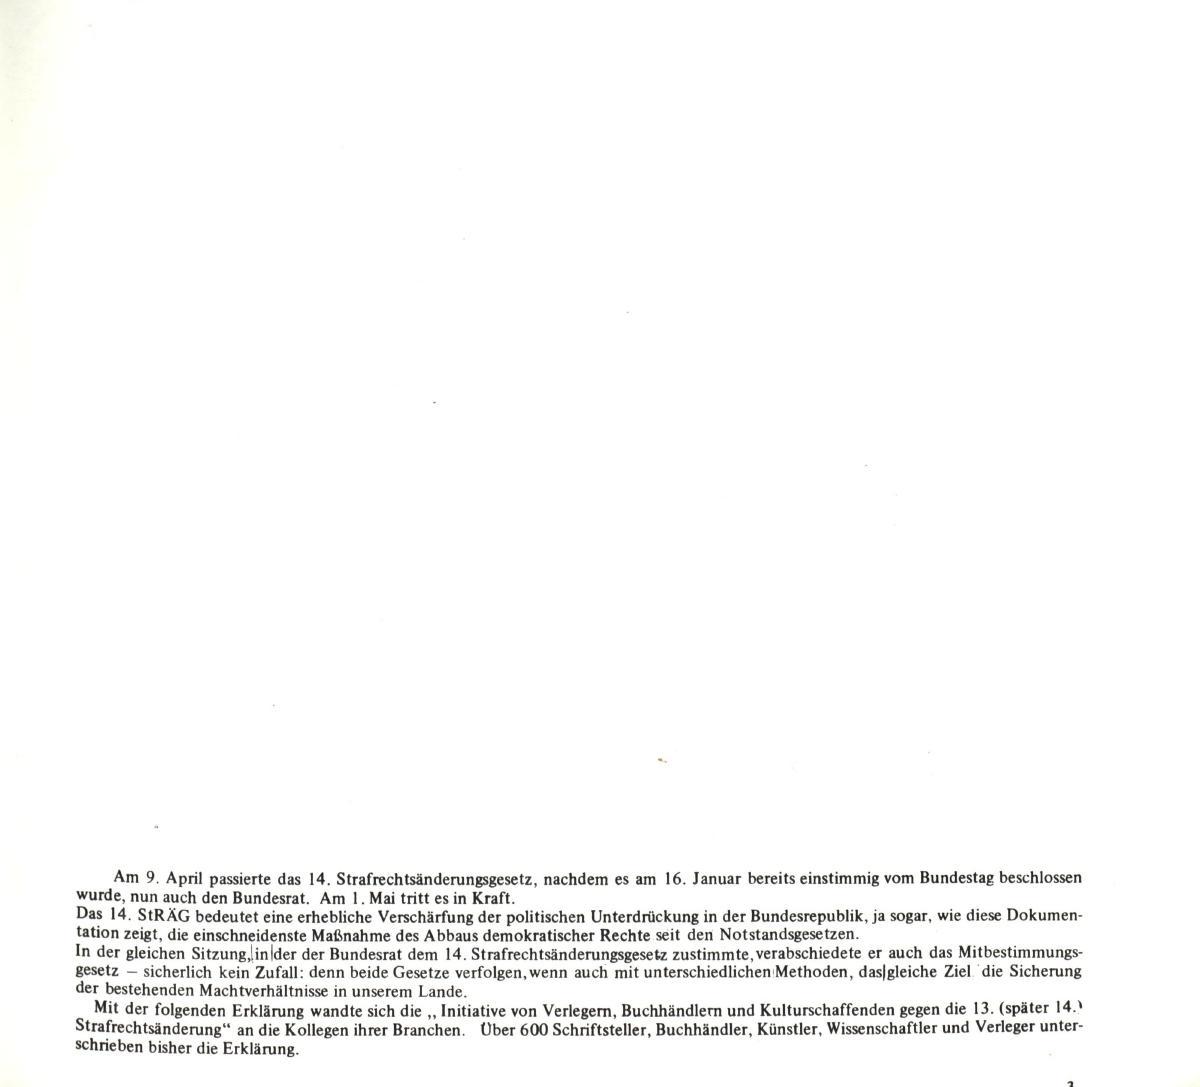 REP_VLB_1976_Die_Zensurgesetze_04